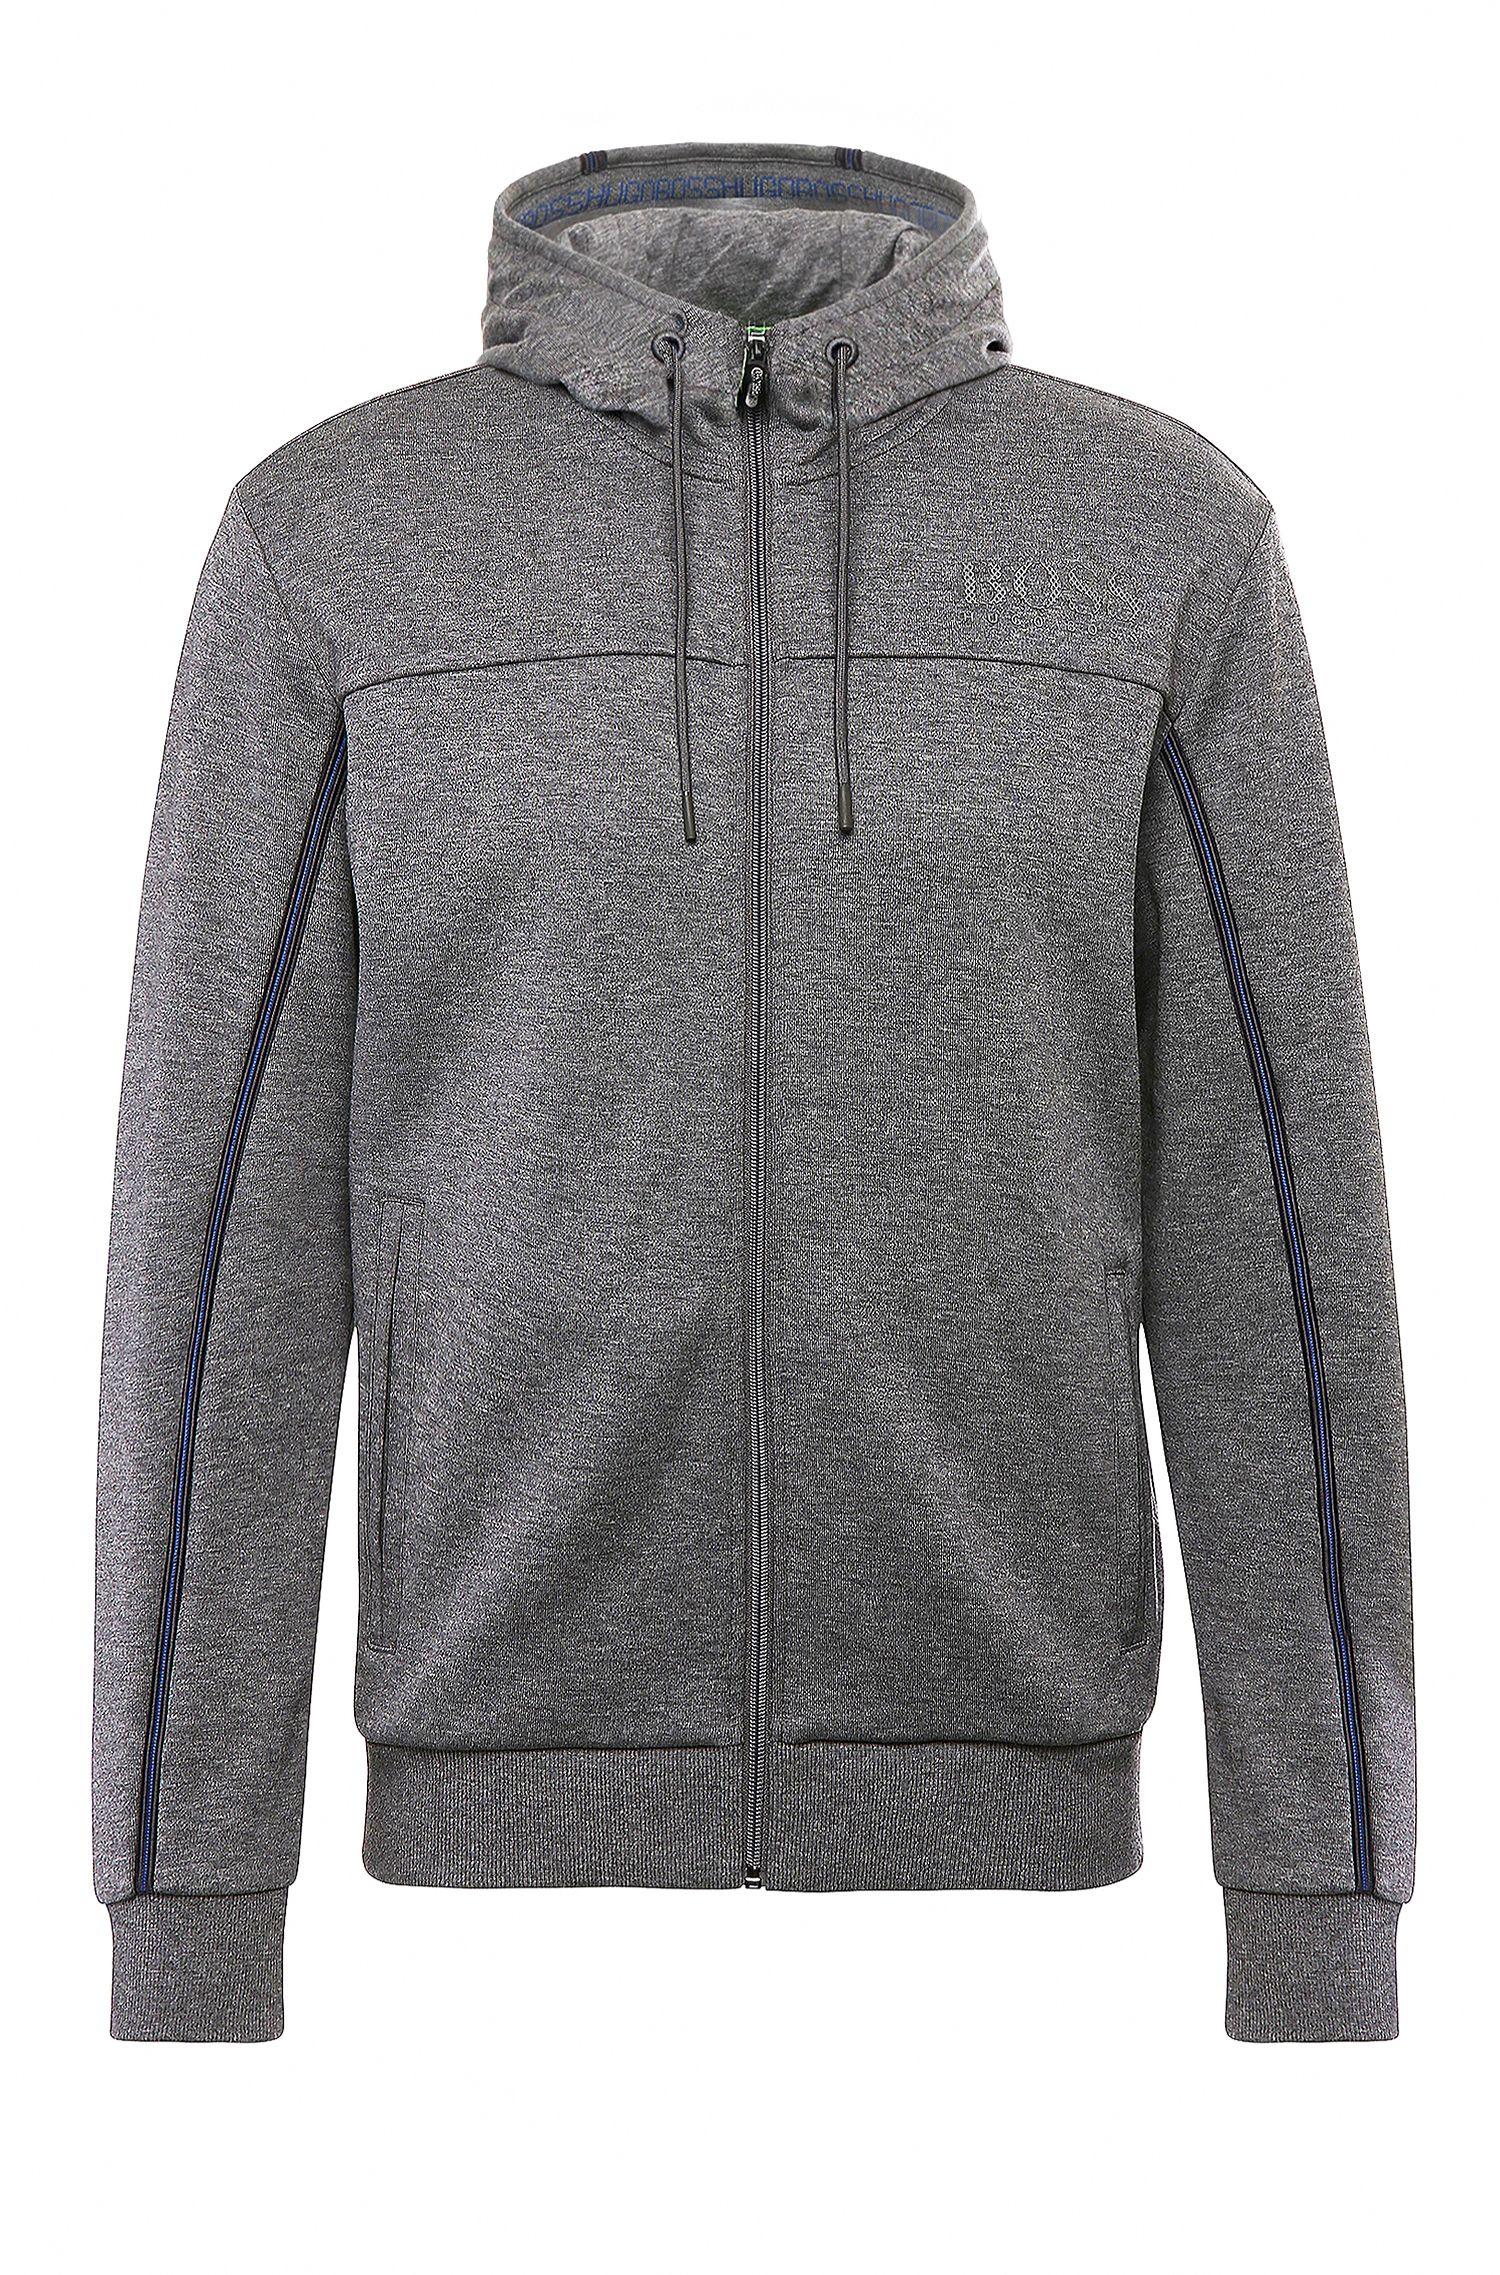 Regular-fit sweatshirt jacket in a cotton blend: 'Saggy'